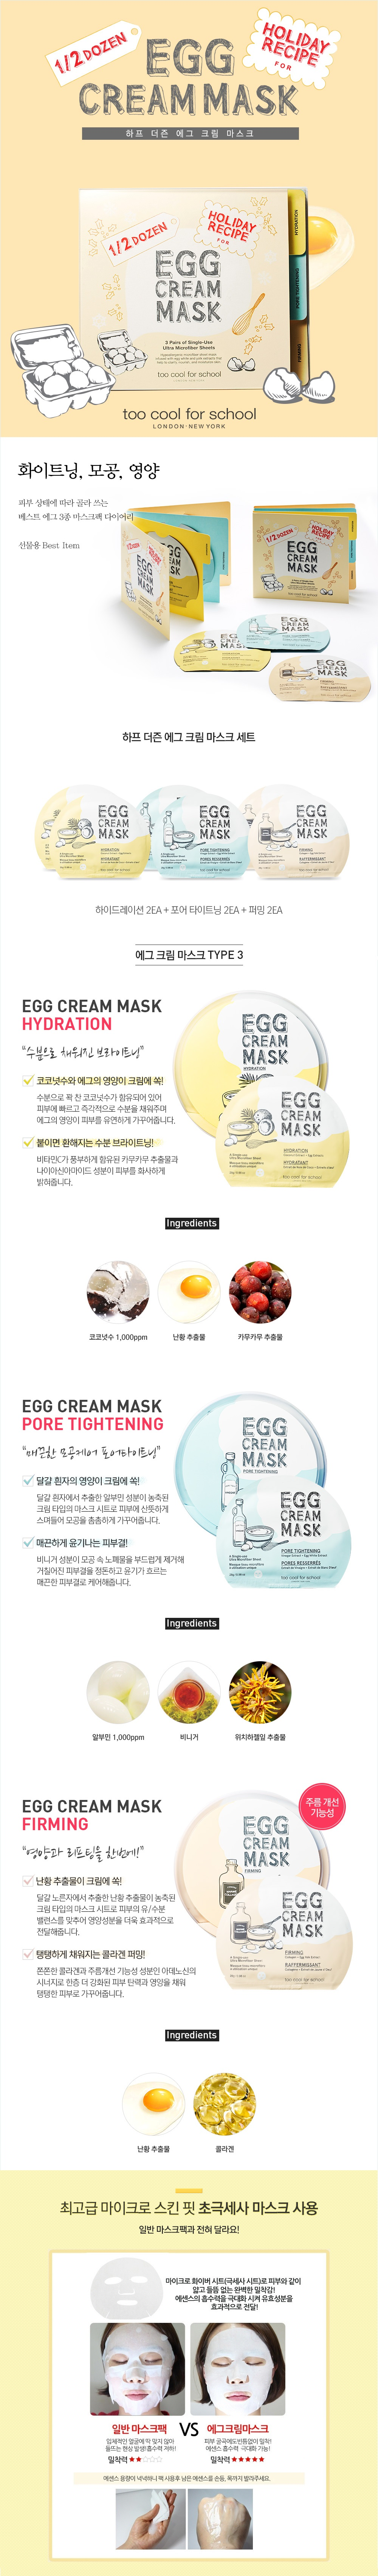 too cool for school Half Dozen Egg Cream Mask Set 168g Malaysia brunei taiwan